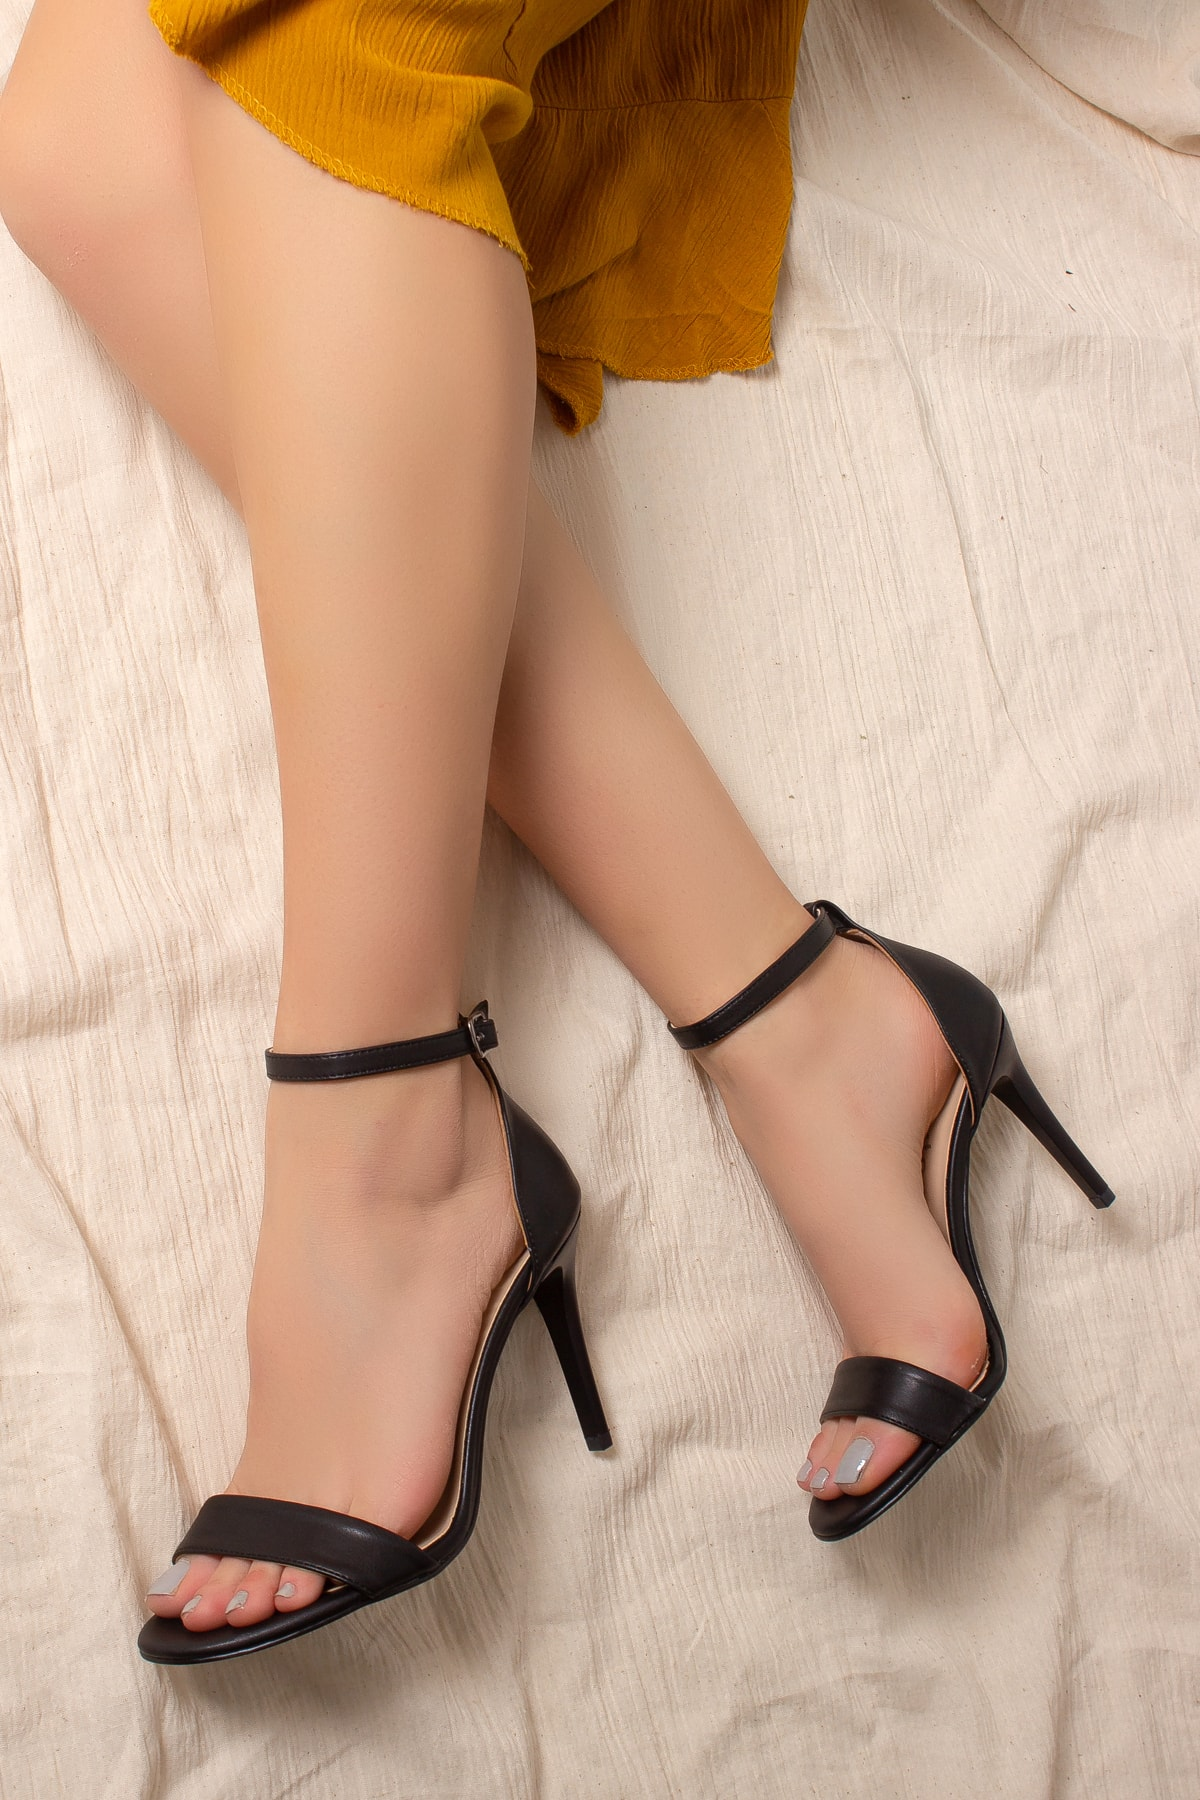 Daxtors Kadın Siyah İnce Topuklu Ayakkabı D2525 1